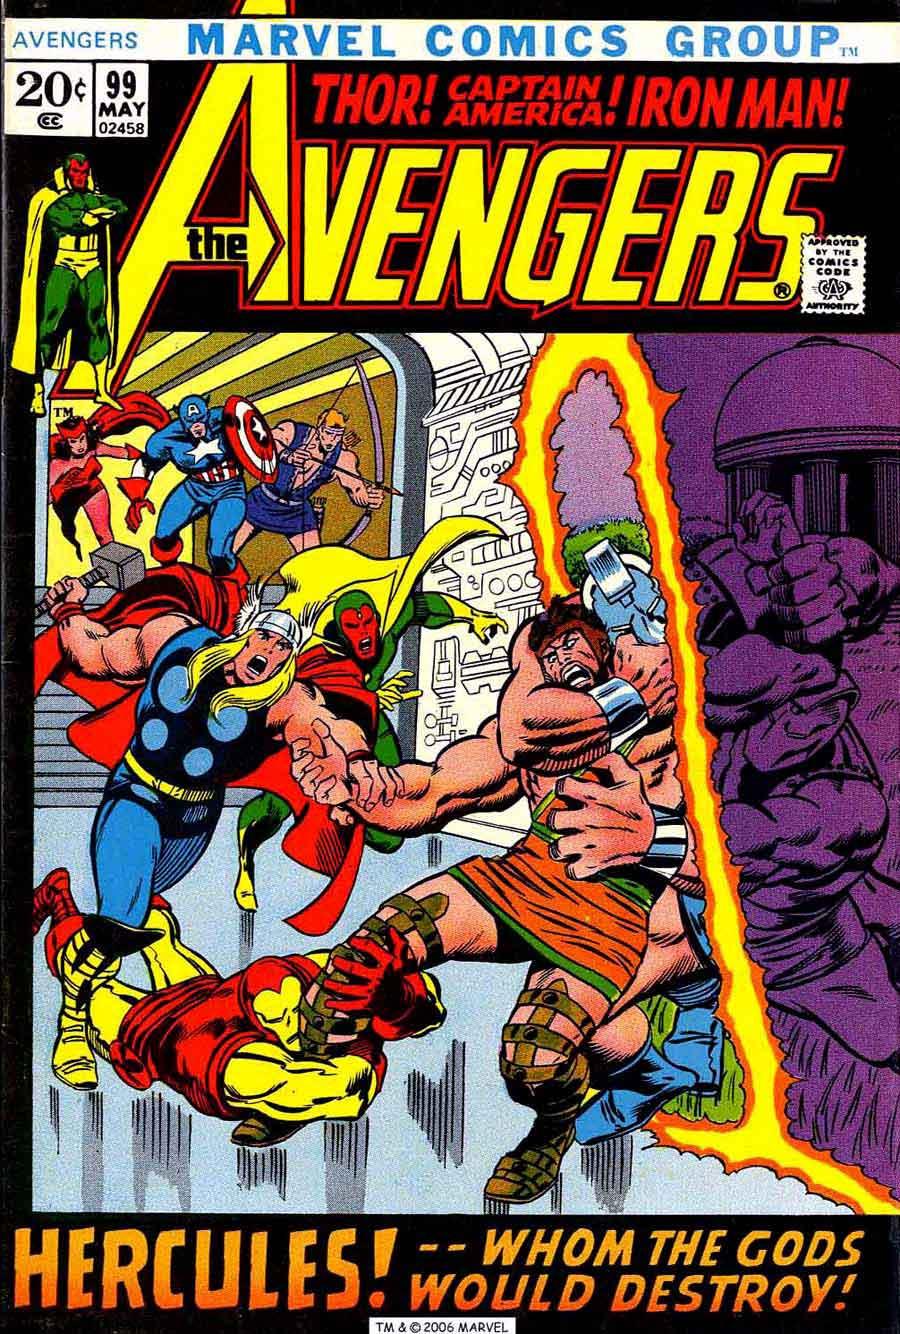 Avengers v1 #99 marvel comic book cover art by Barry Windsor Smith